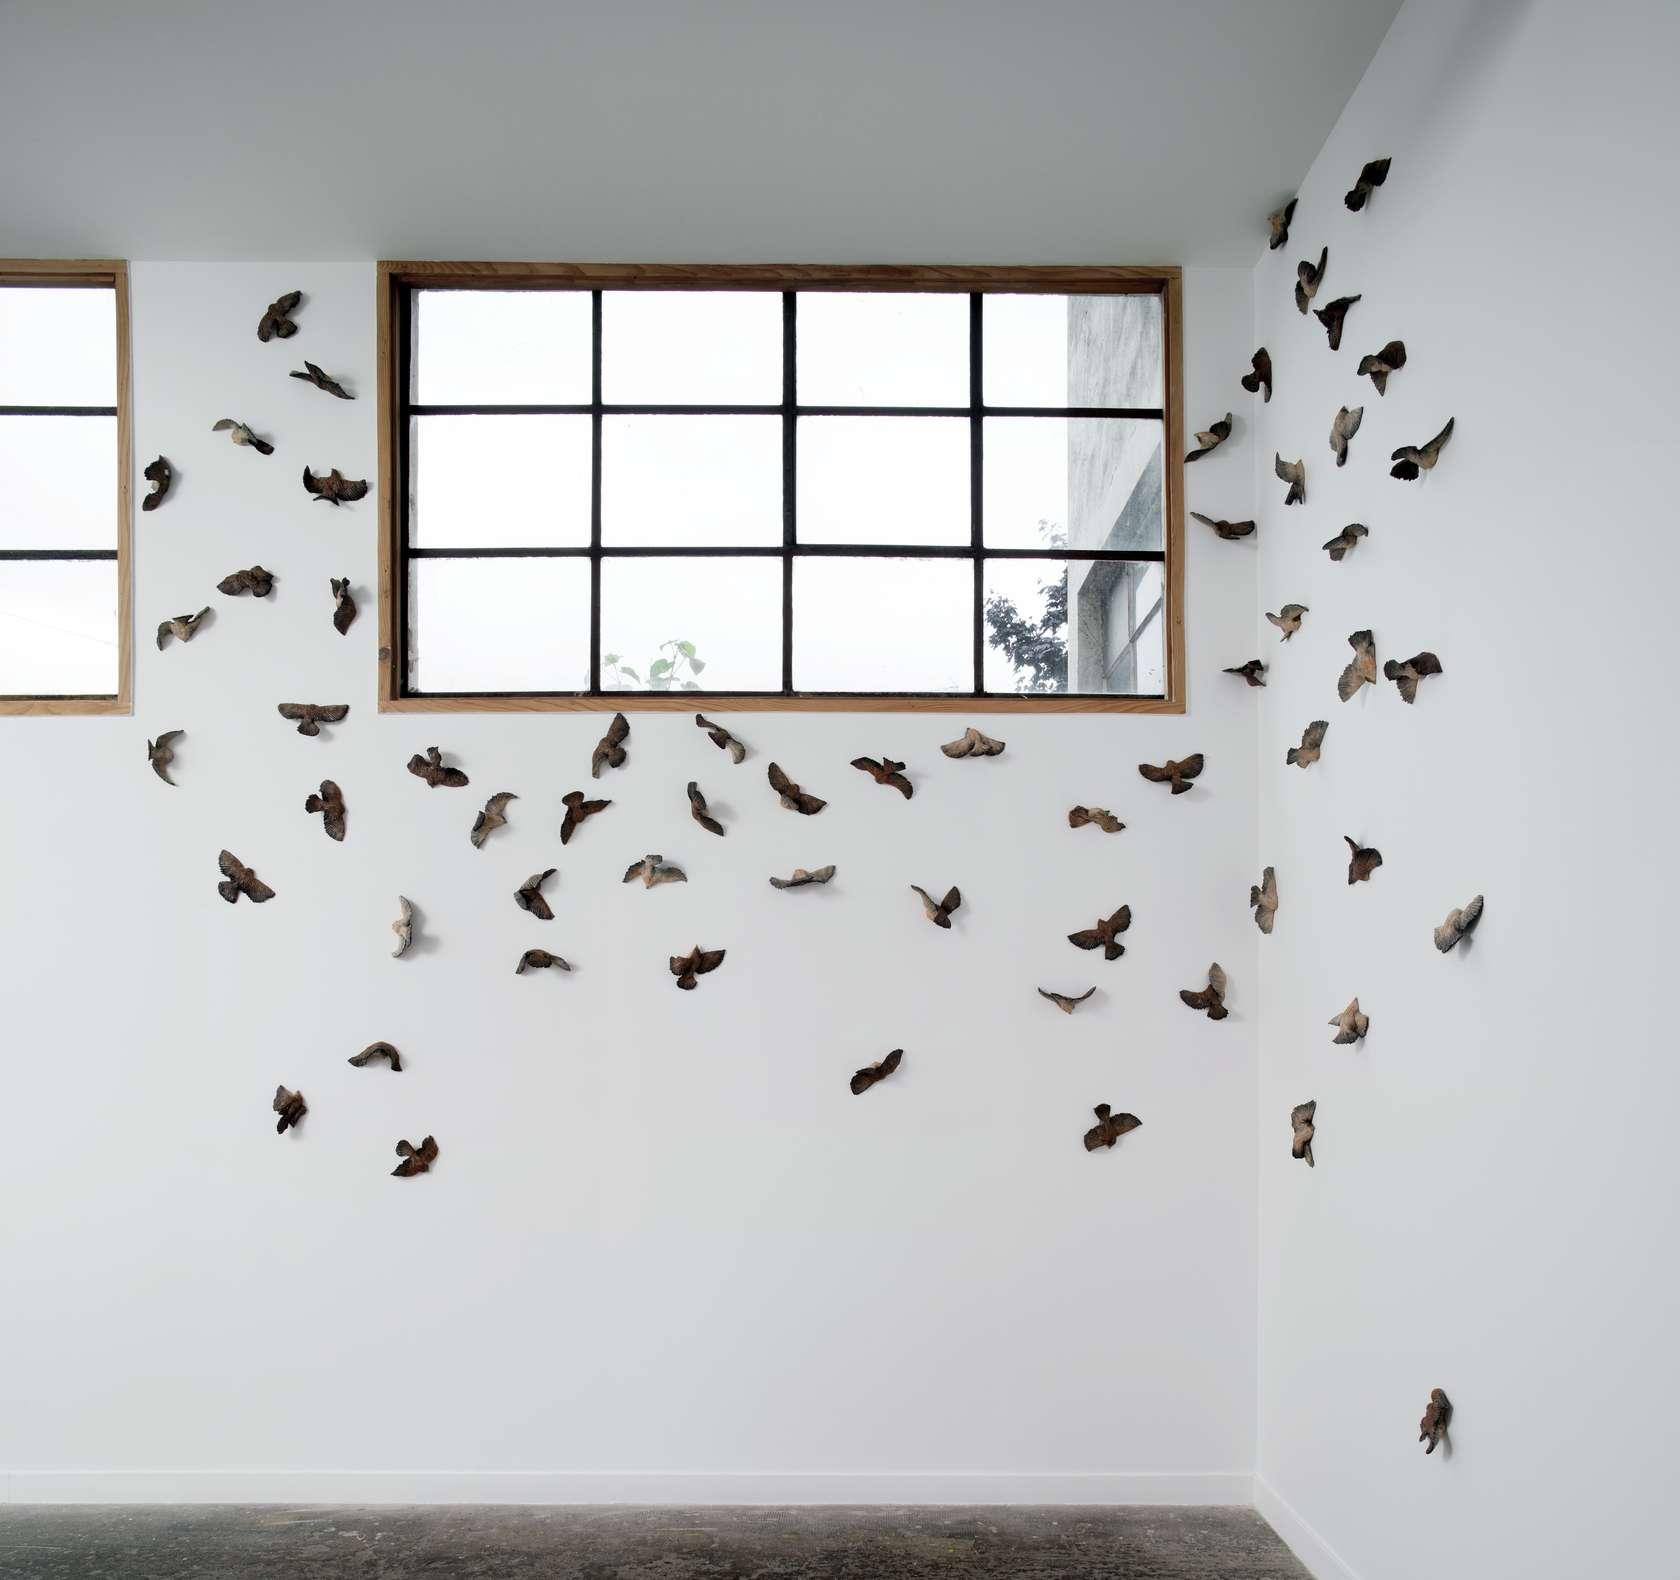 Sébastien Gouju, For the Birds, 2017 Céramique émaillée - 60 pièces